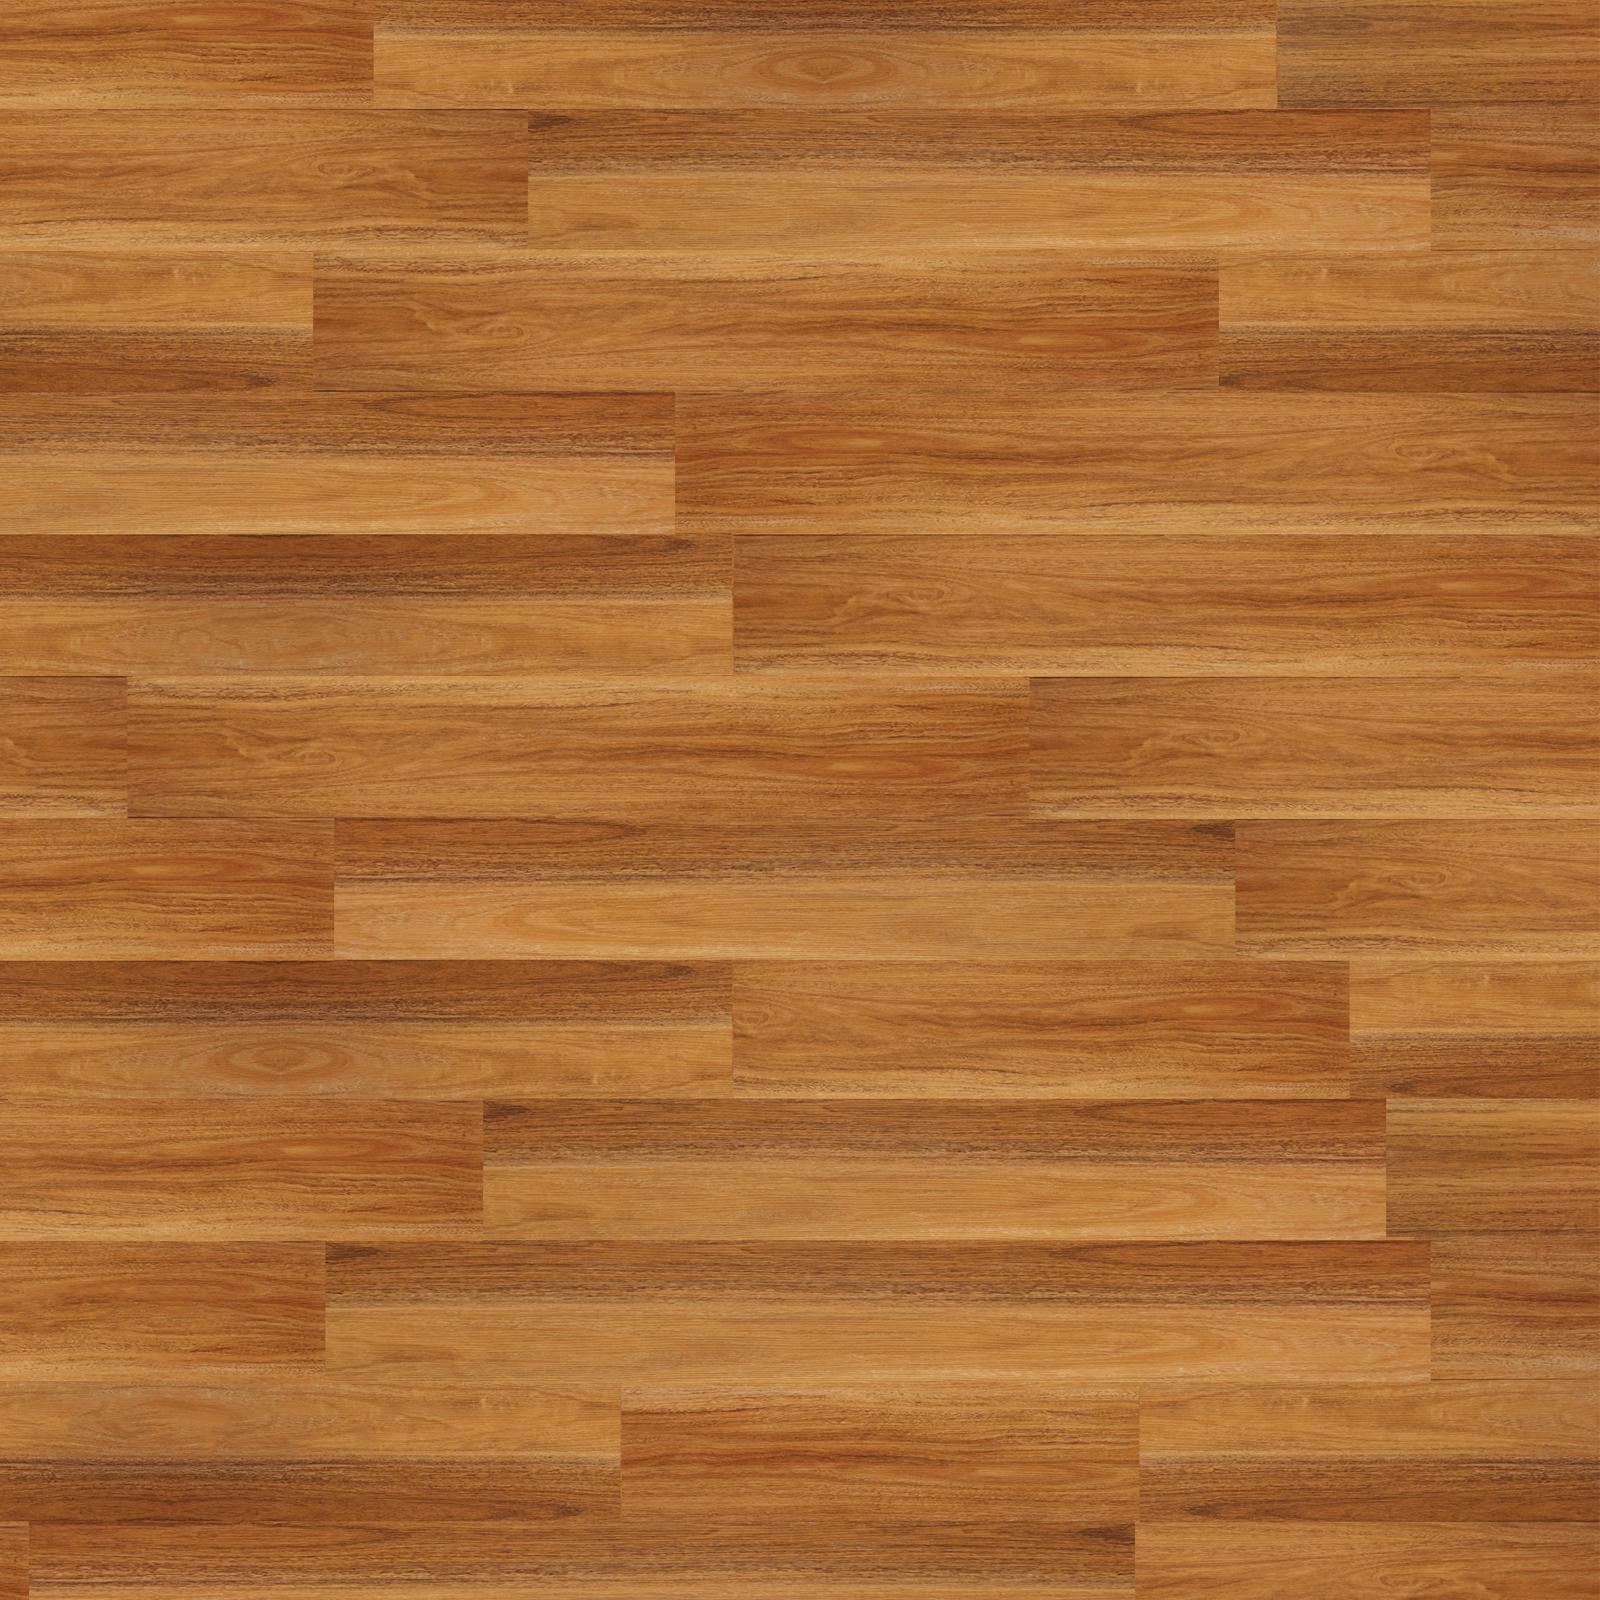 Floor Select 10mm 1.42sqm Spotted Gum Water Resistant Laminate Flooring